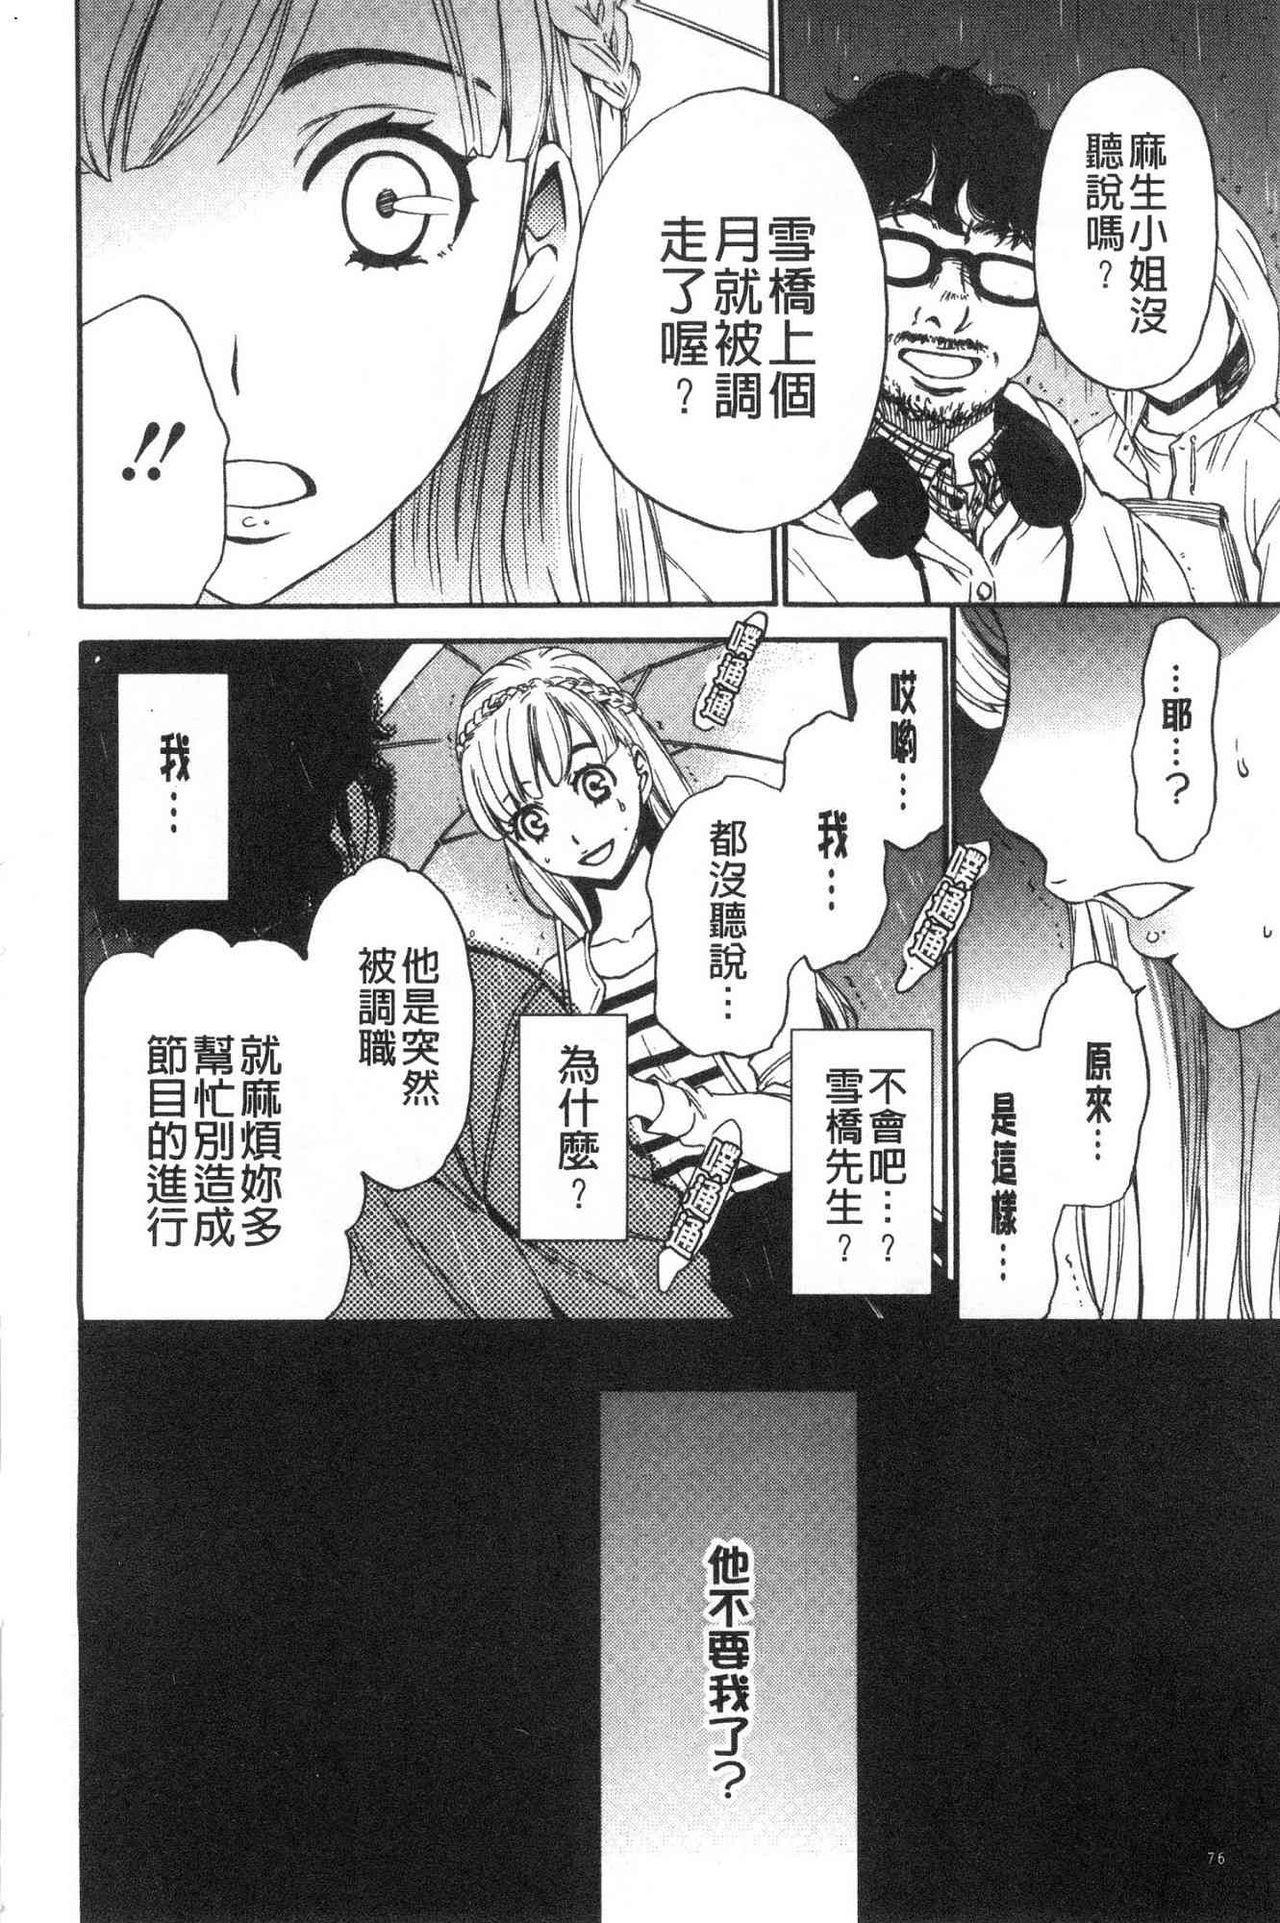 [Gotoh Akira]  21-ji no Onna ~Camera no Mae no Mesuinu~ 2 | 21時之女 ~鏡頭前的牝犬~ 2 [Chinese] 77